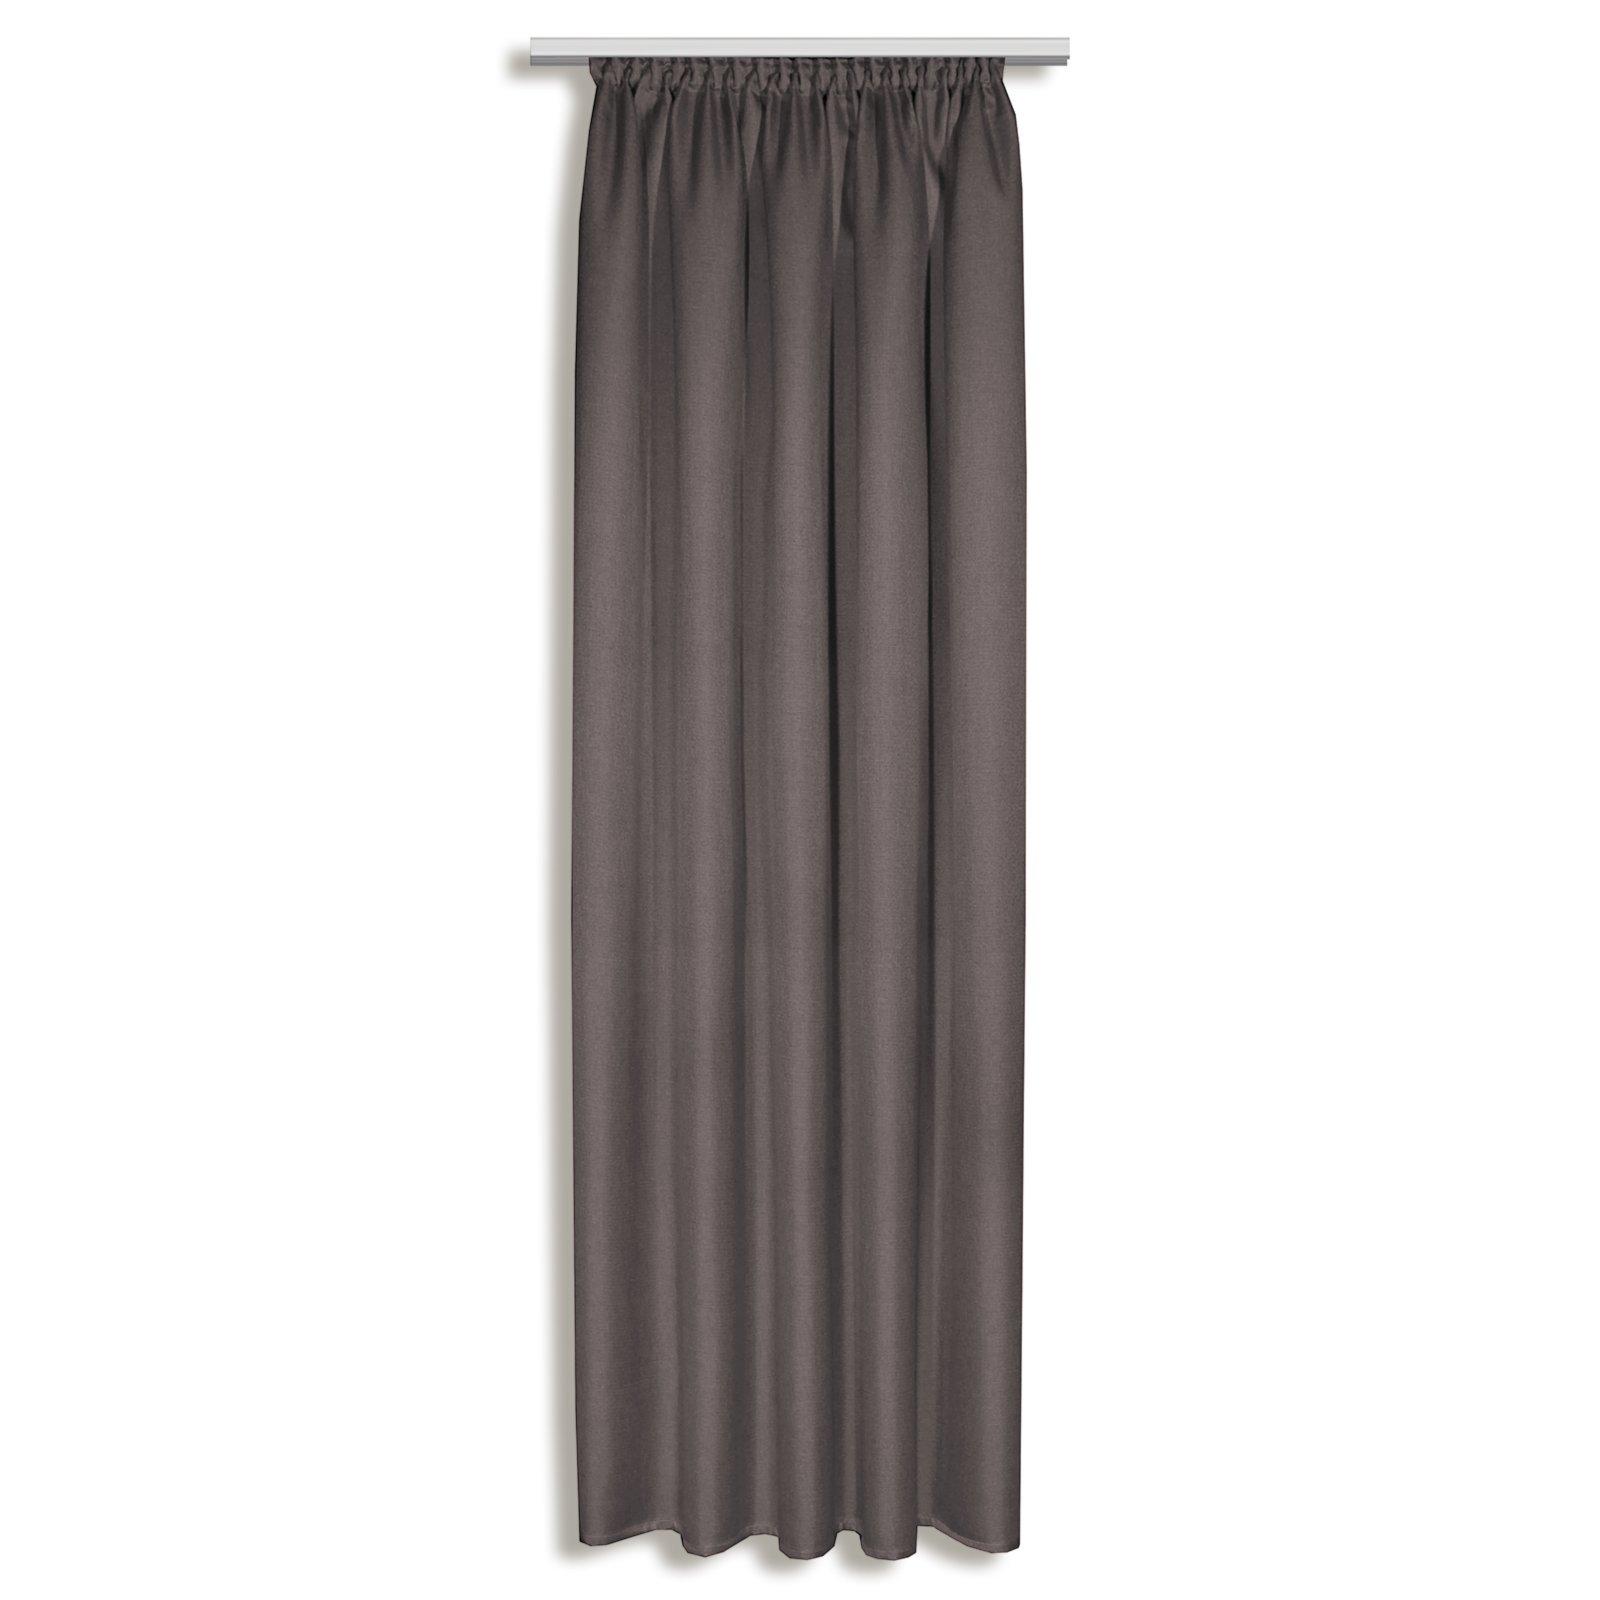 vorhang selma taupe 135x245 cm blickdichte gardinen. Black Bedroom Furniture Sets. Home Design Ideas